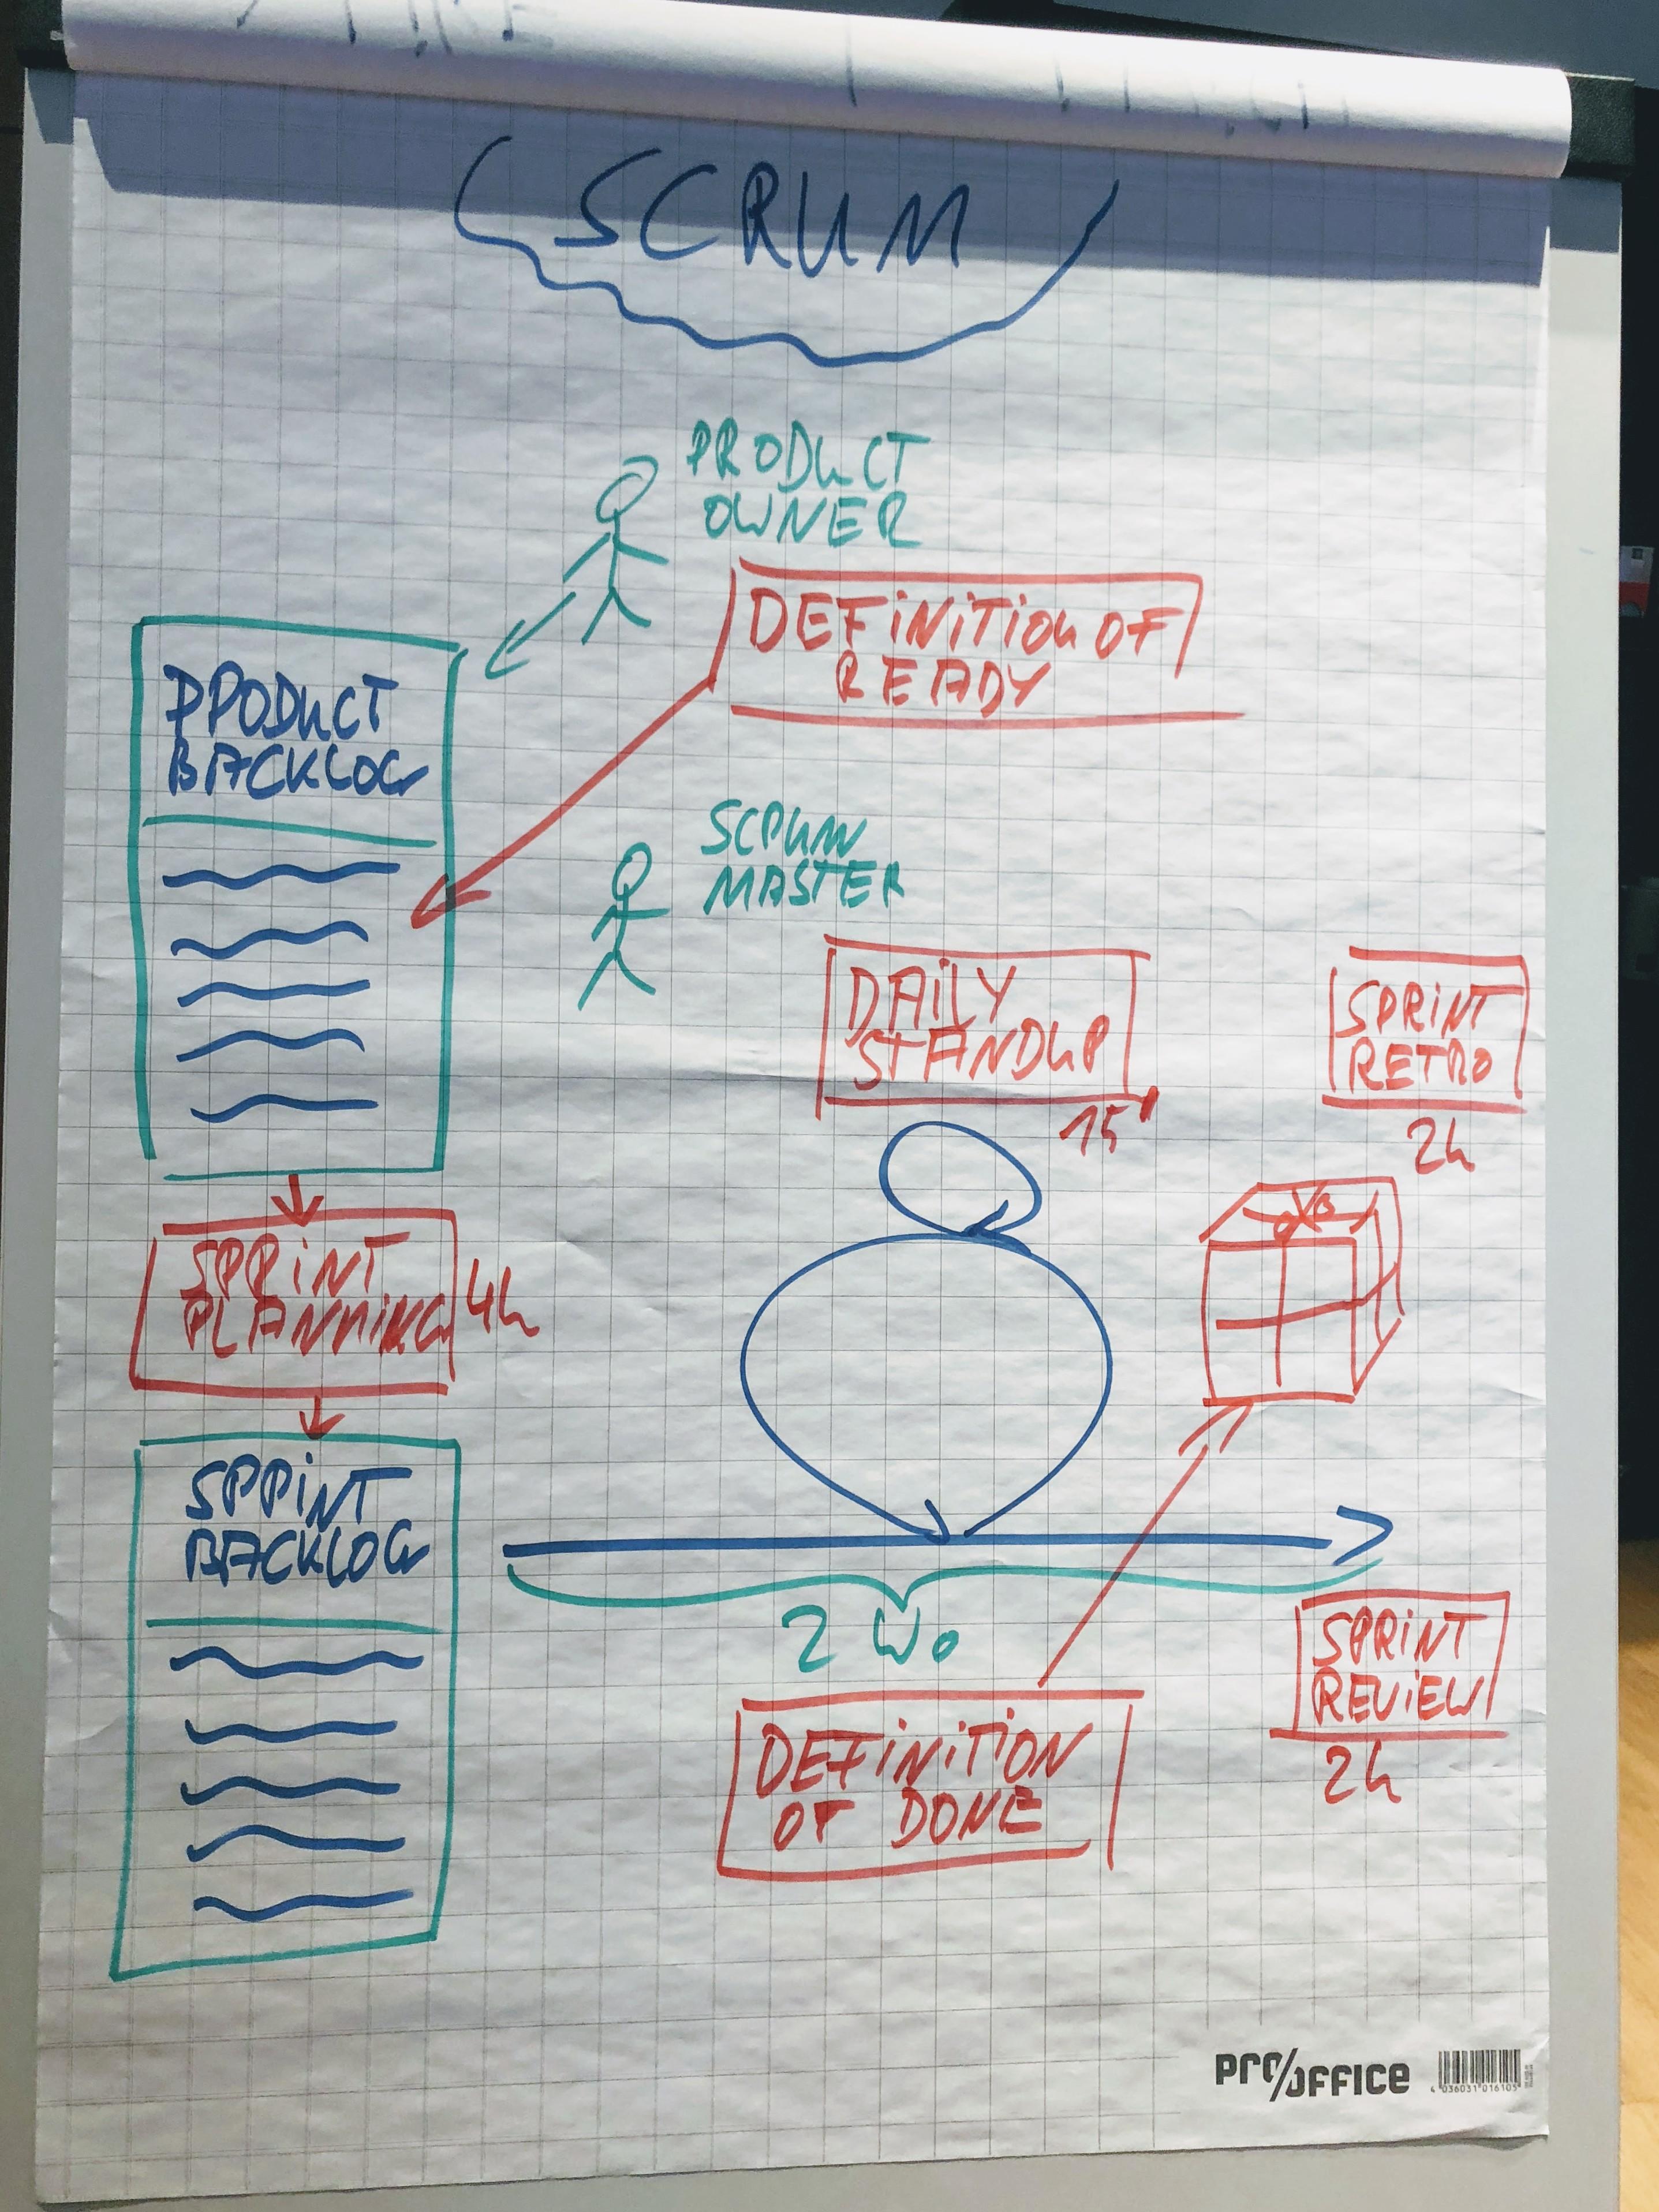 Agile Methoden Seminar Workshop Lean Startup Scrum Business Model Generation Digital Agile Coach Bastian Deurer